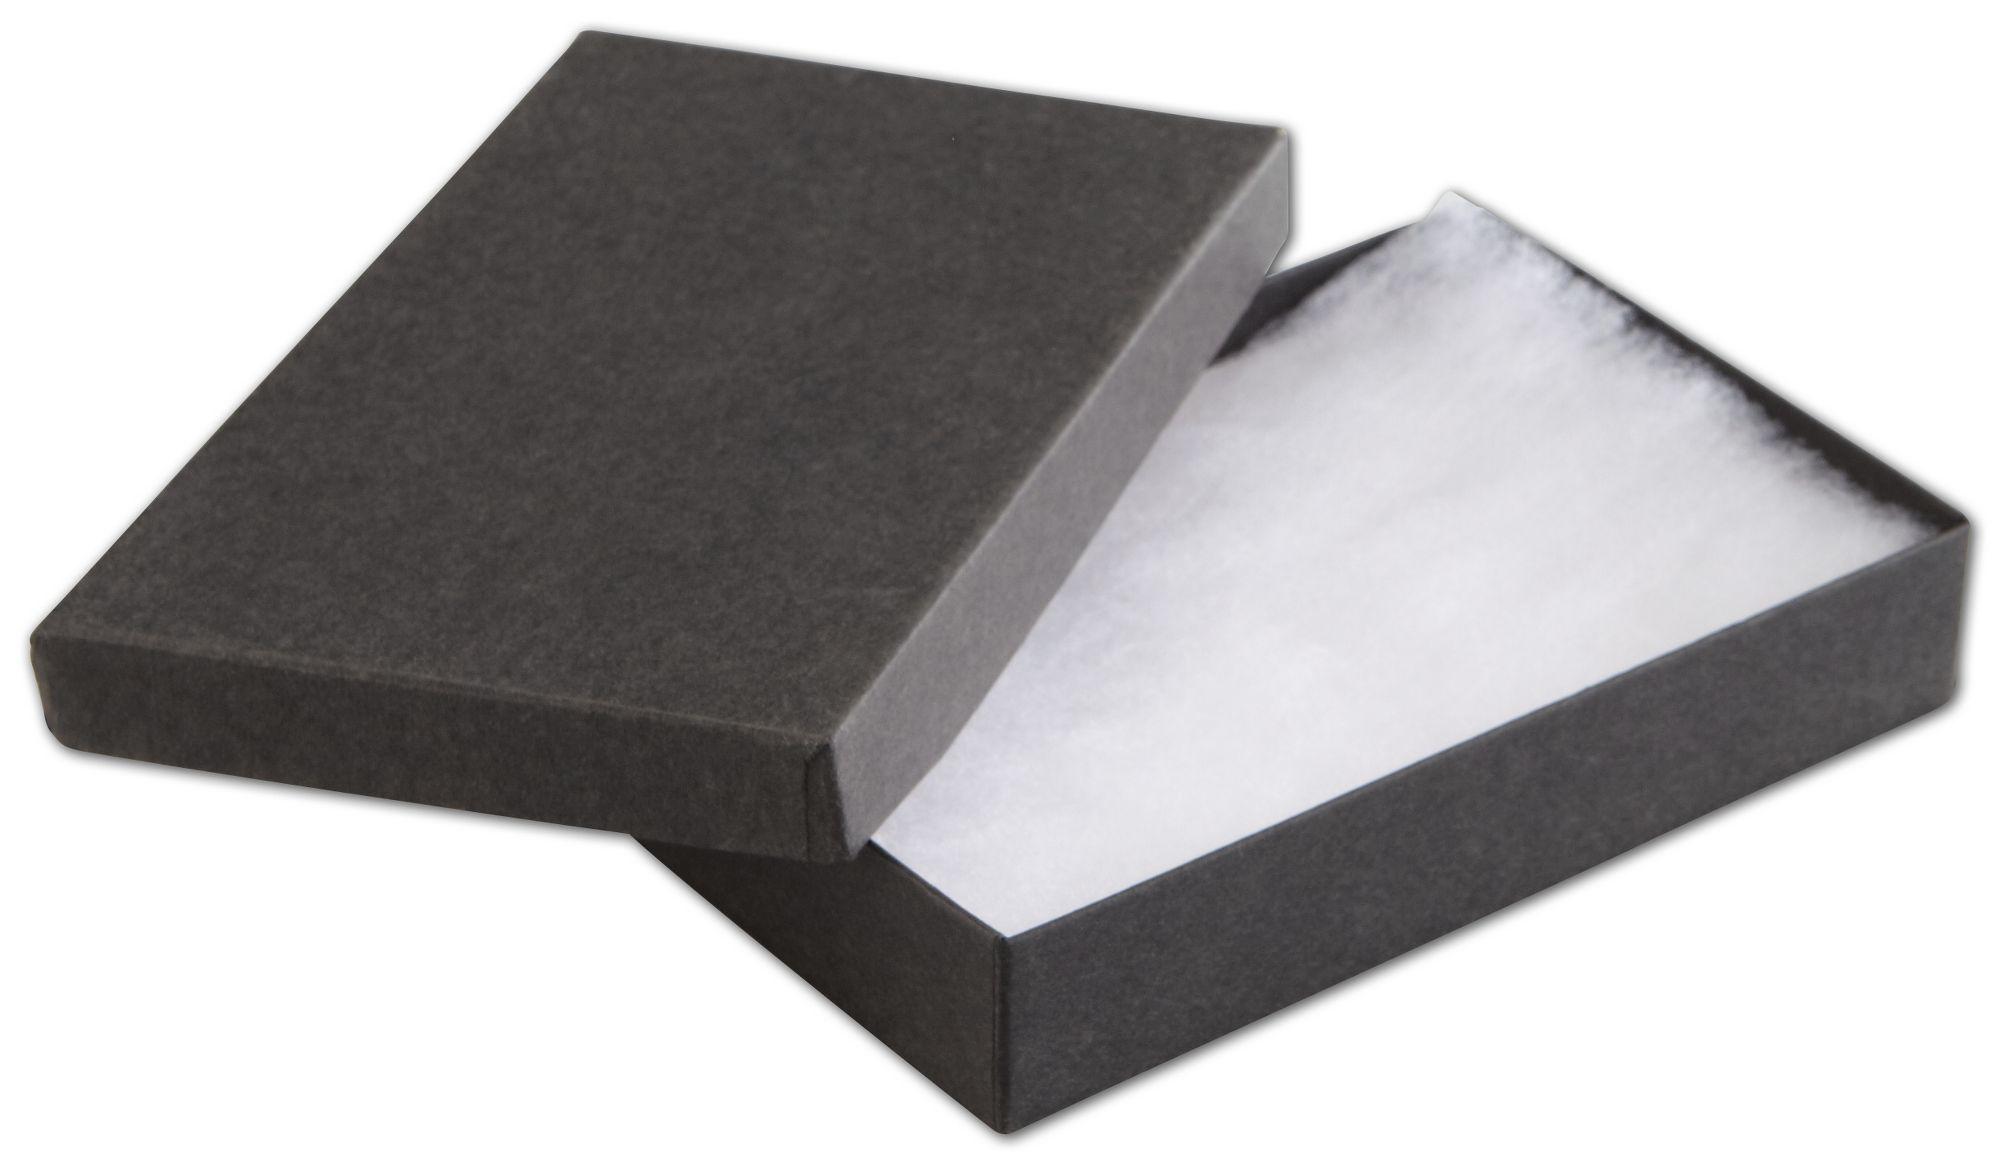 Black Jewelry Boxes 5 7 16 X 3 1 2